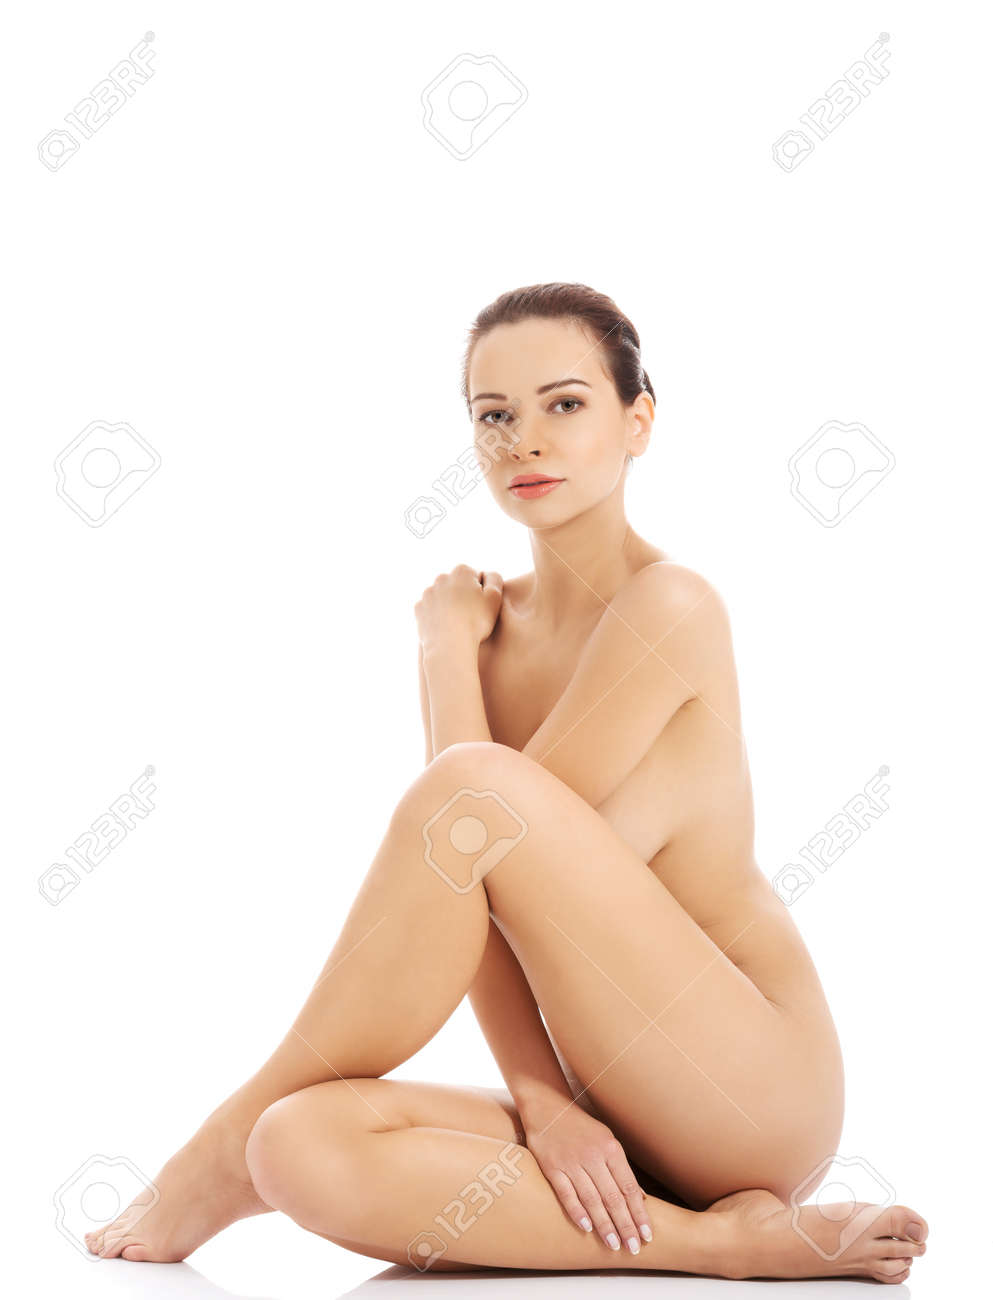 Free small virgin pussy pics